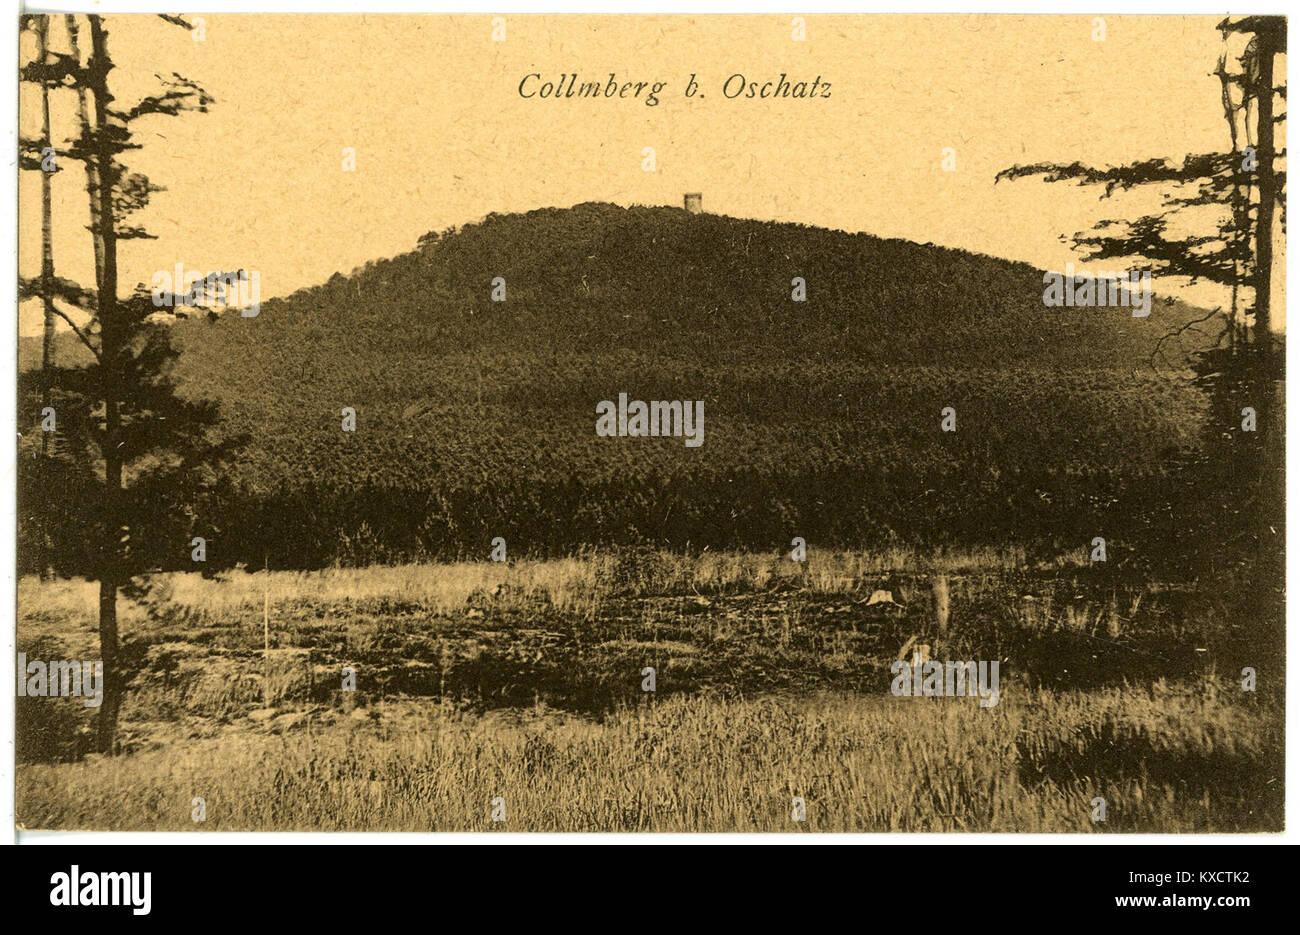 21681-Collm-1920-Collmberg-Brück & Sohn Kunstverlag Stock Photo